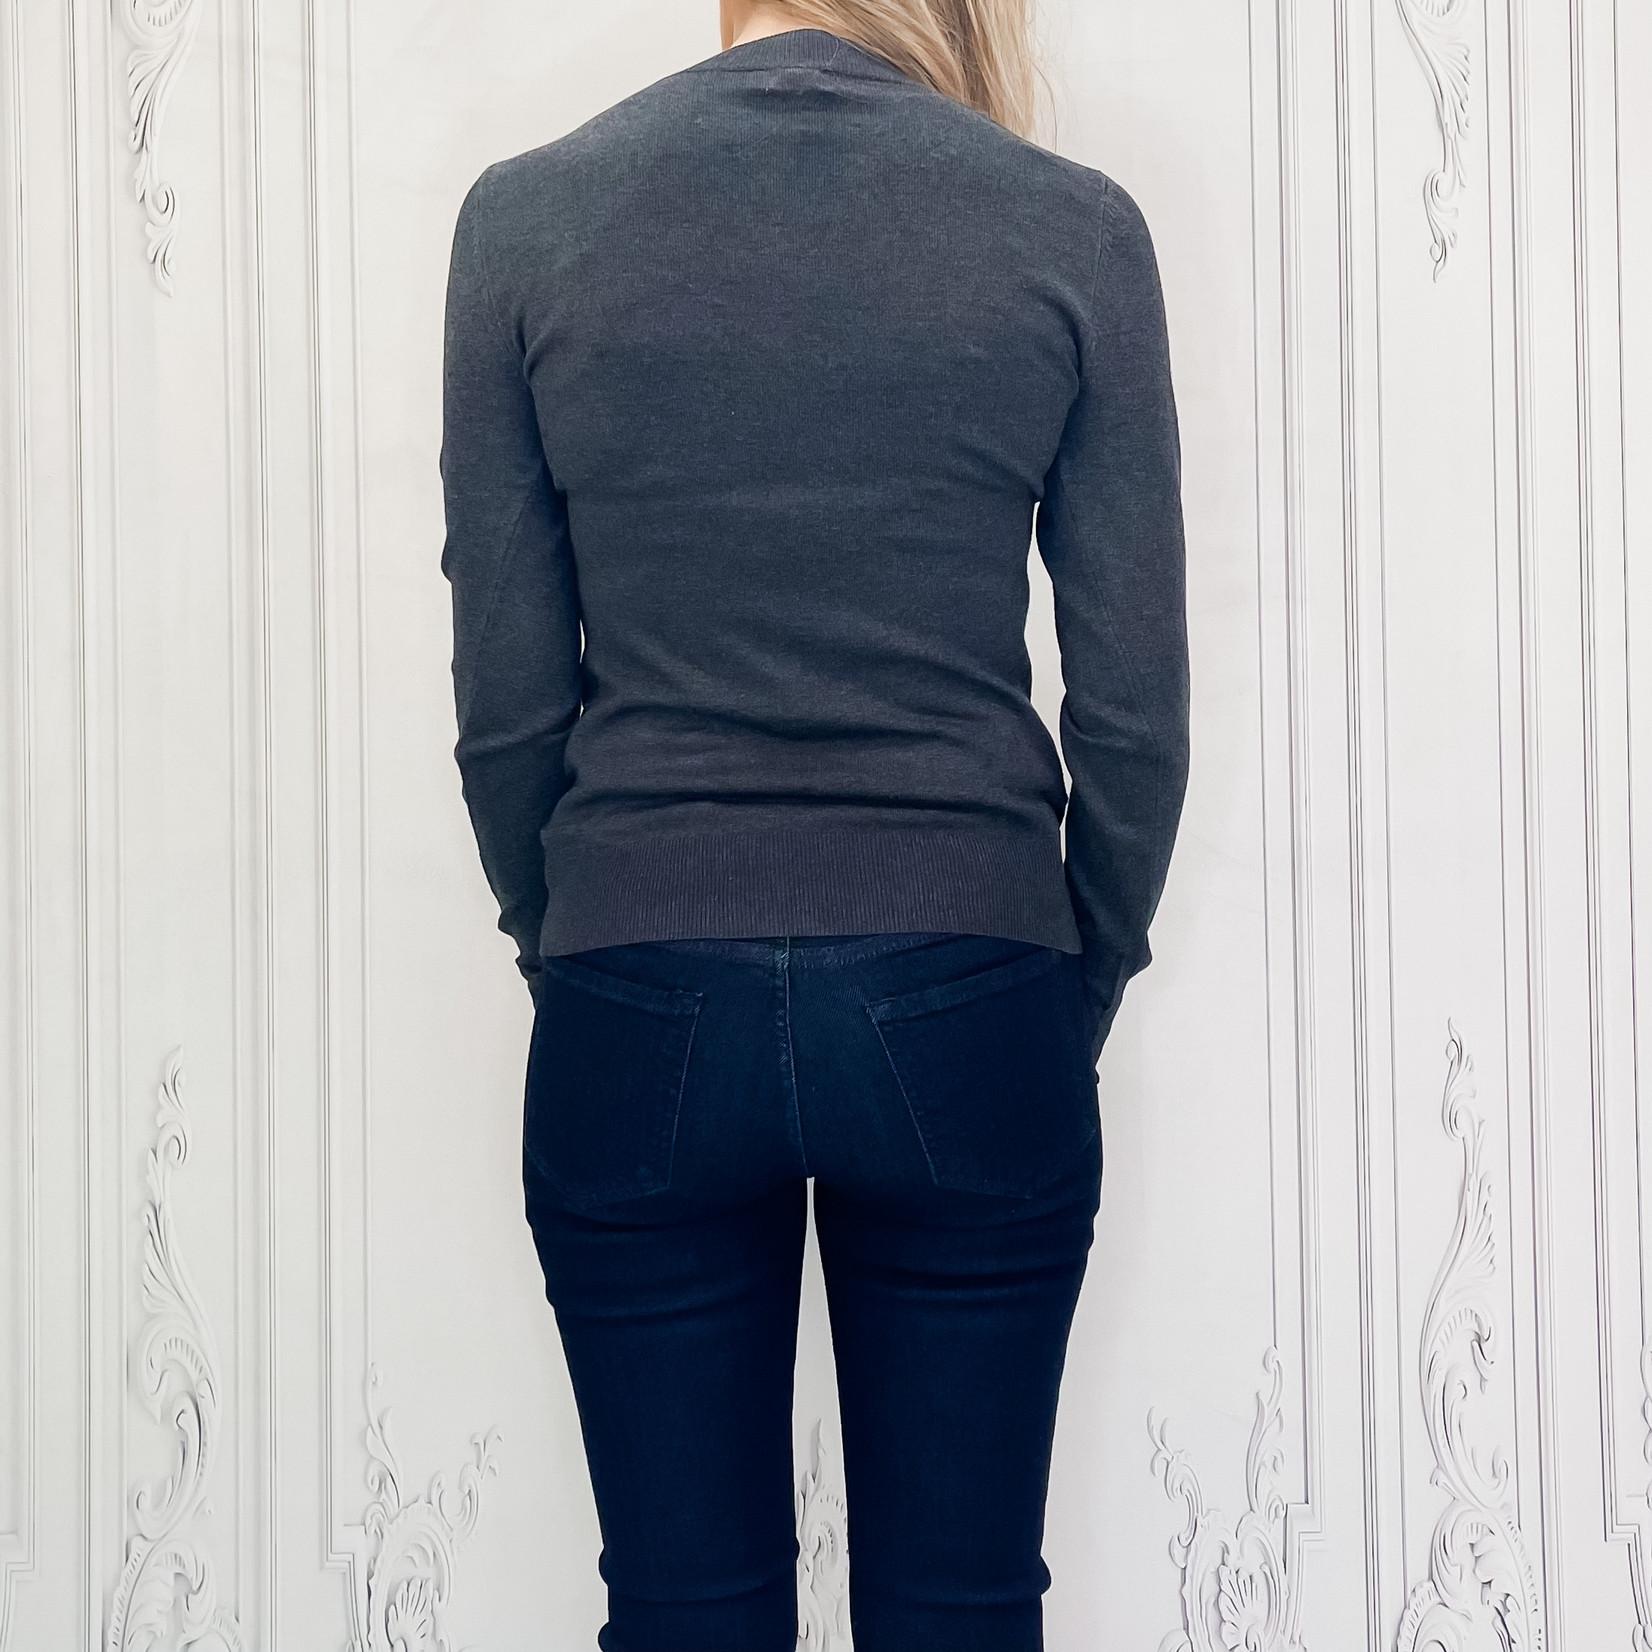 Carrie v neck sweater